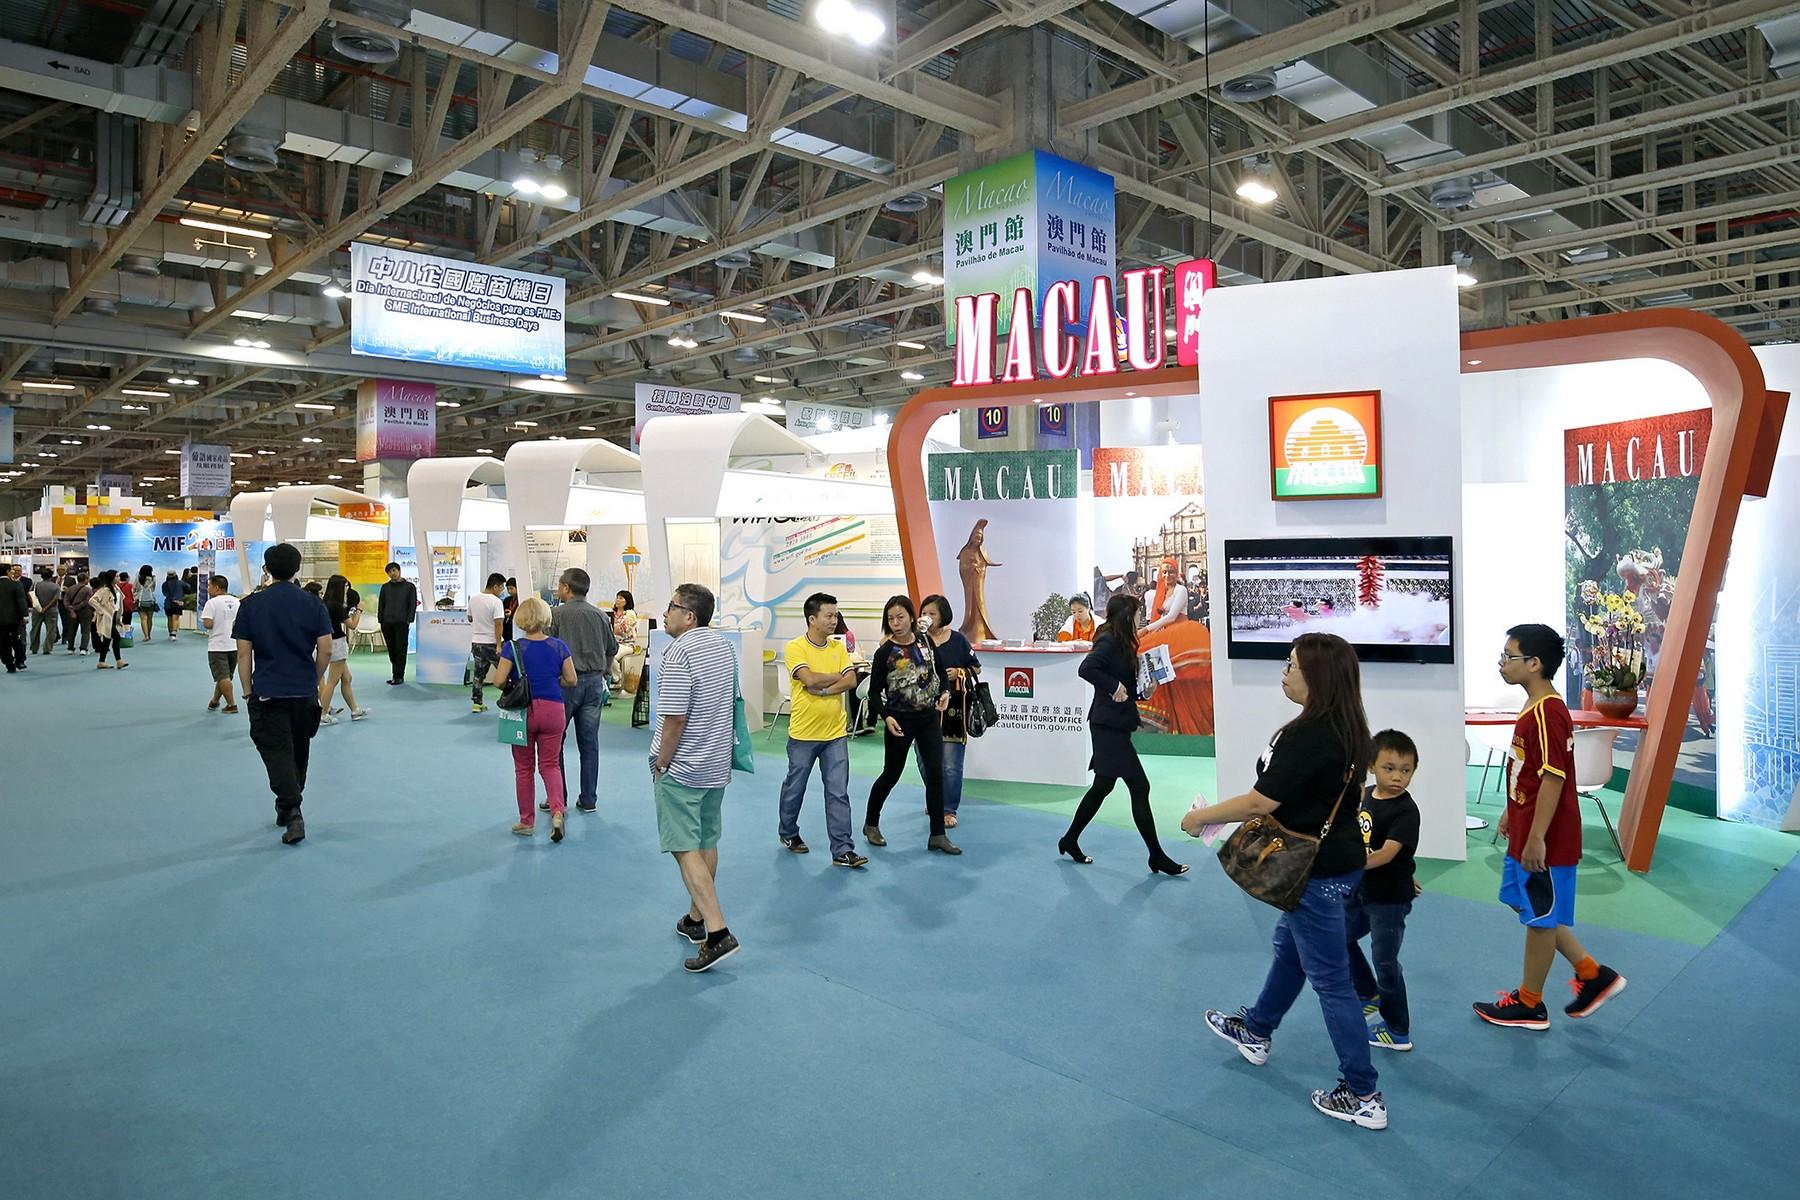 21st Macau International Fairto invite Portugal as 'partner country'